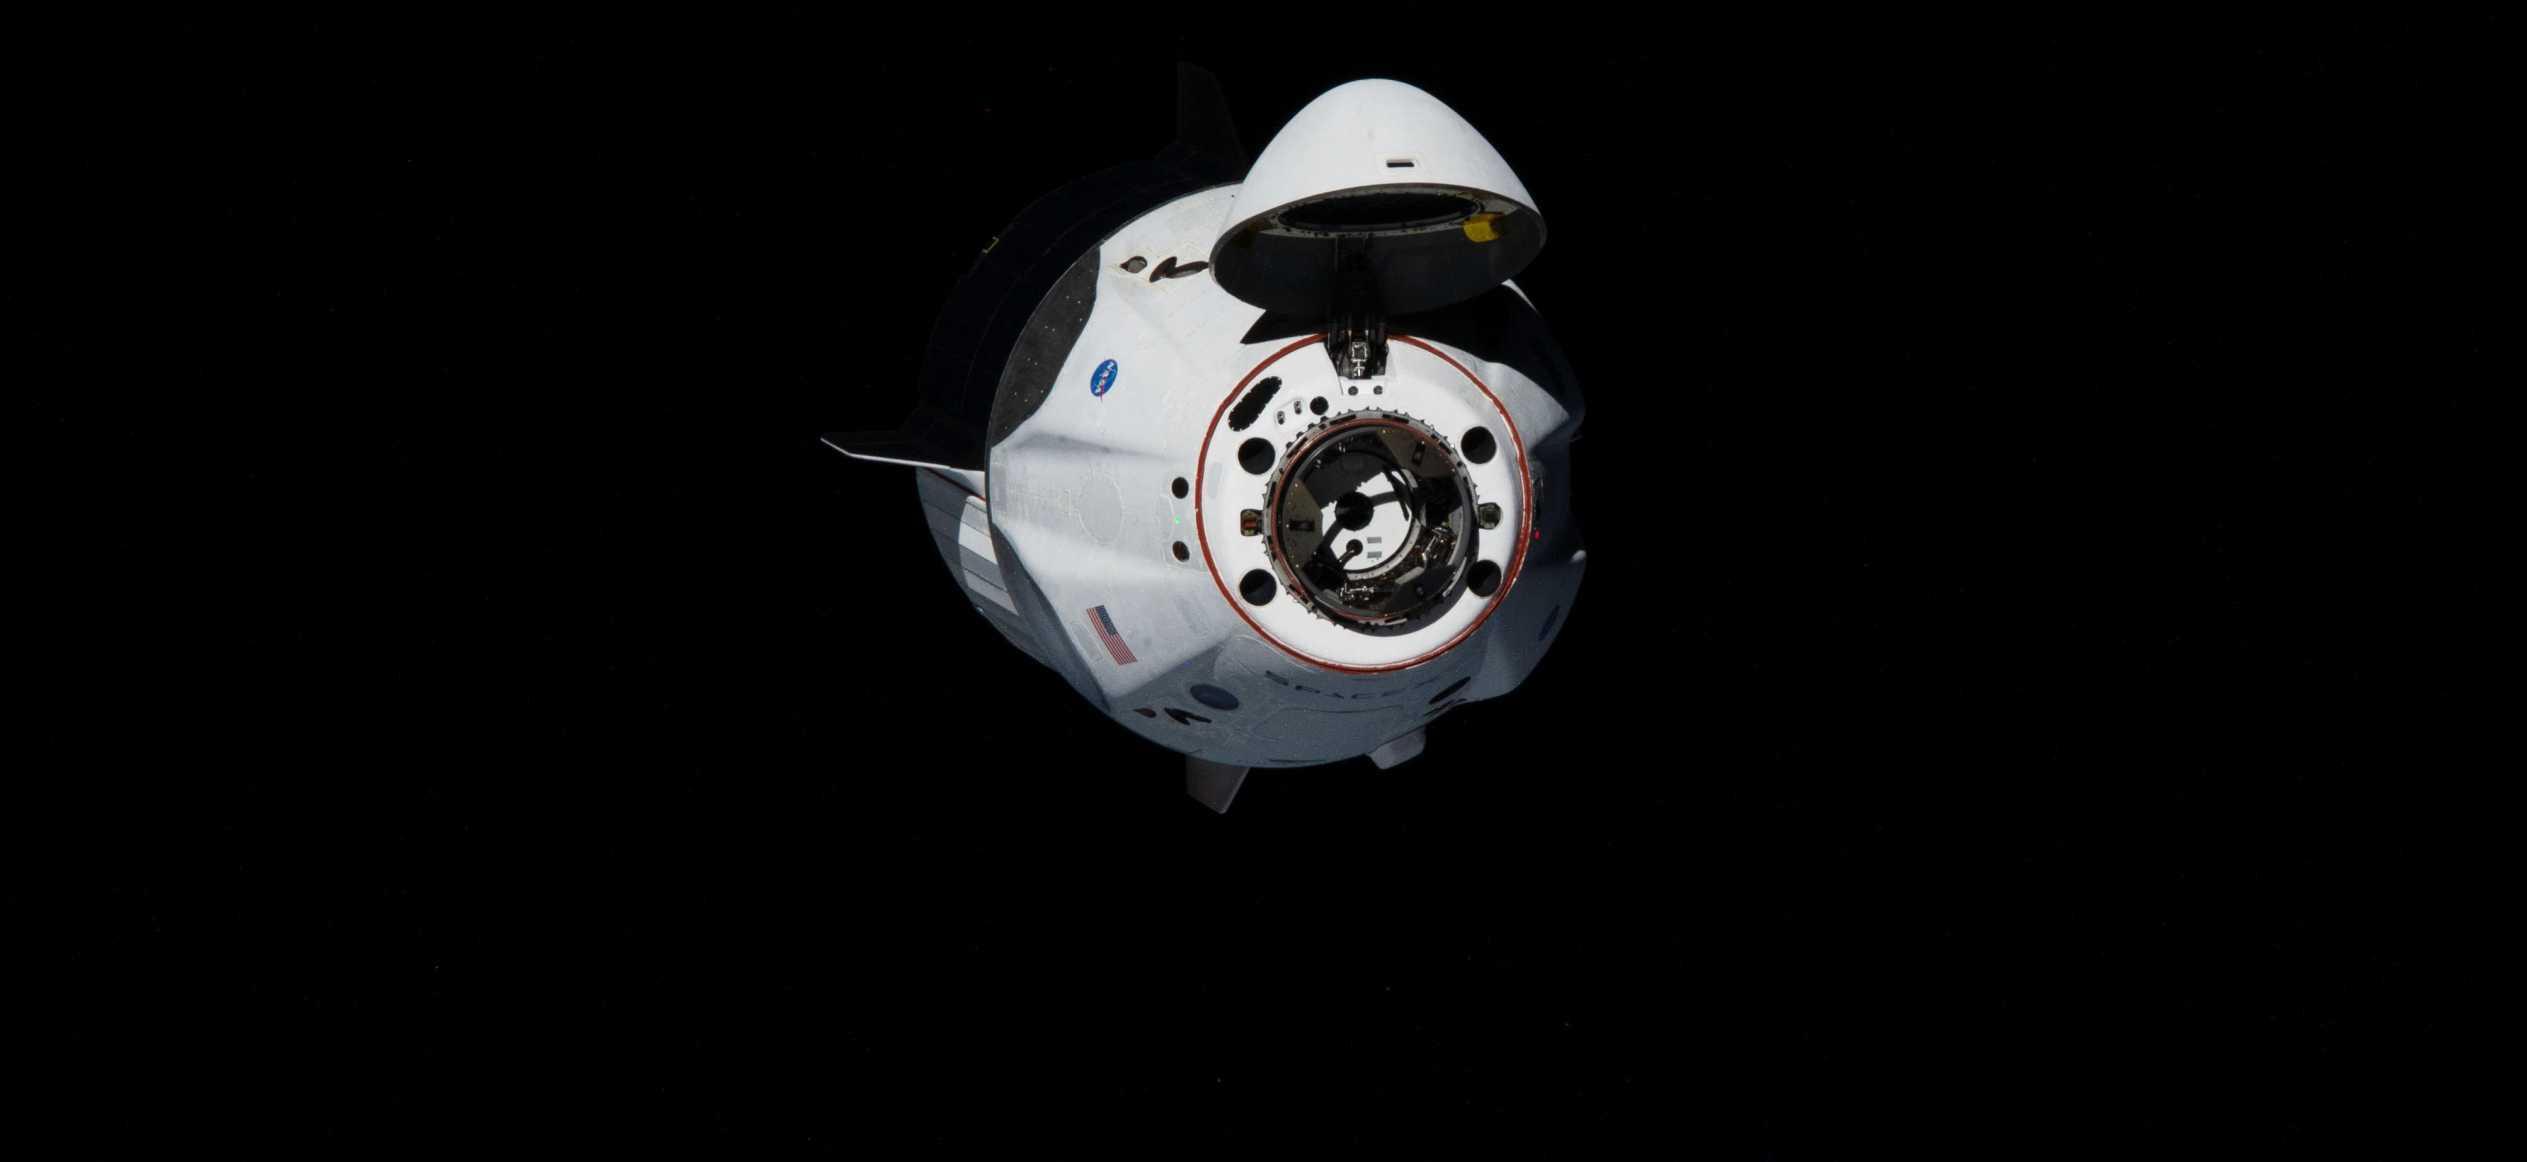 Crew Dragon C206 Demo-2 ISS arrival 053120 (NASA) 2 crop (c)